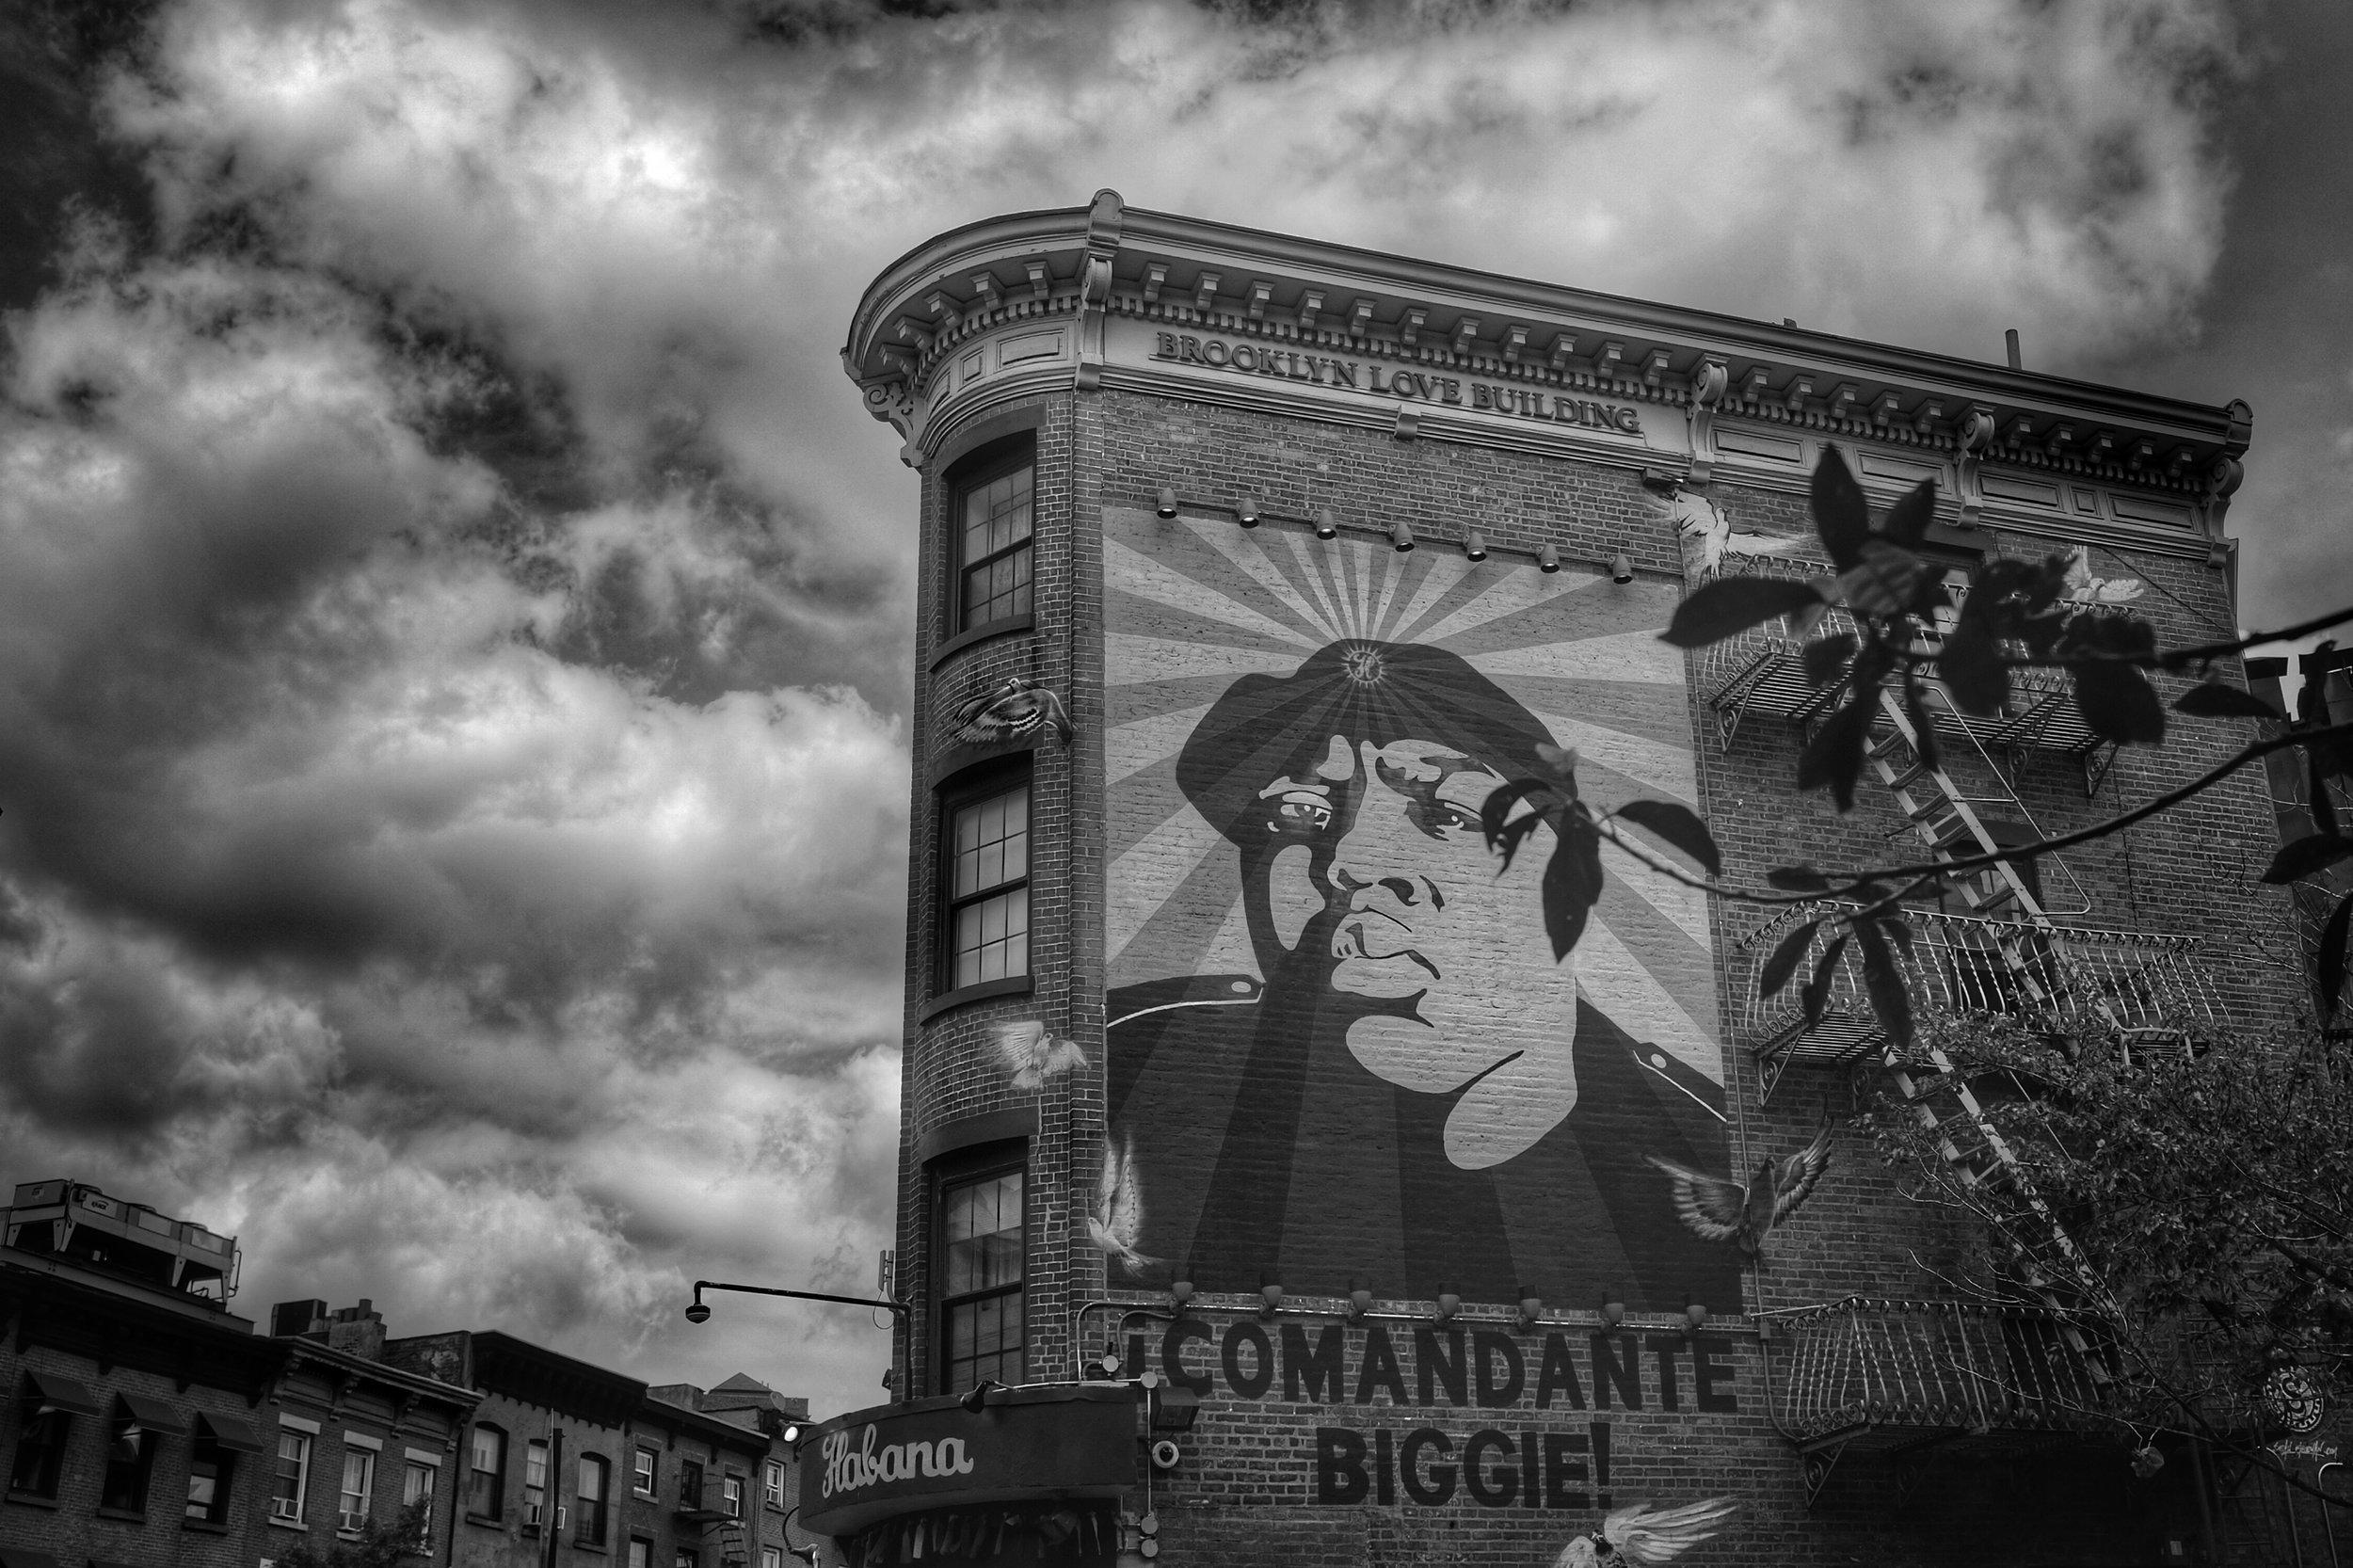 Comandante Biggie. Brooklyn Love Building. Fort Greene. Brooklyn. New York. 2016.